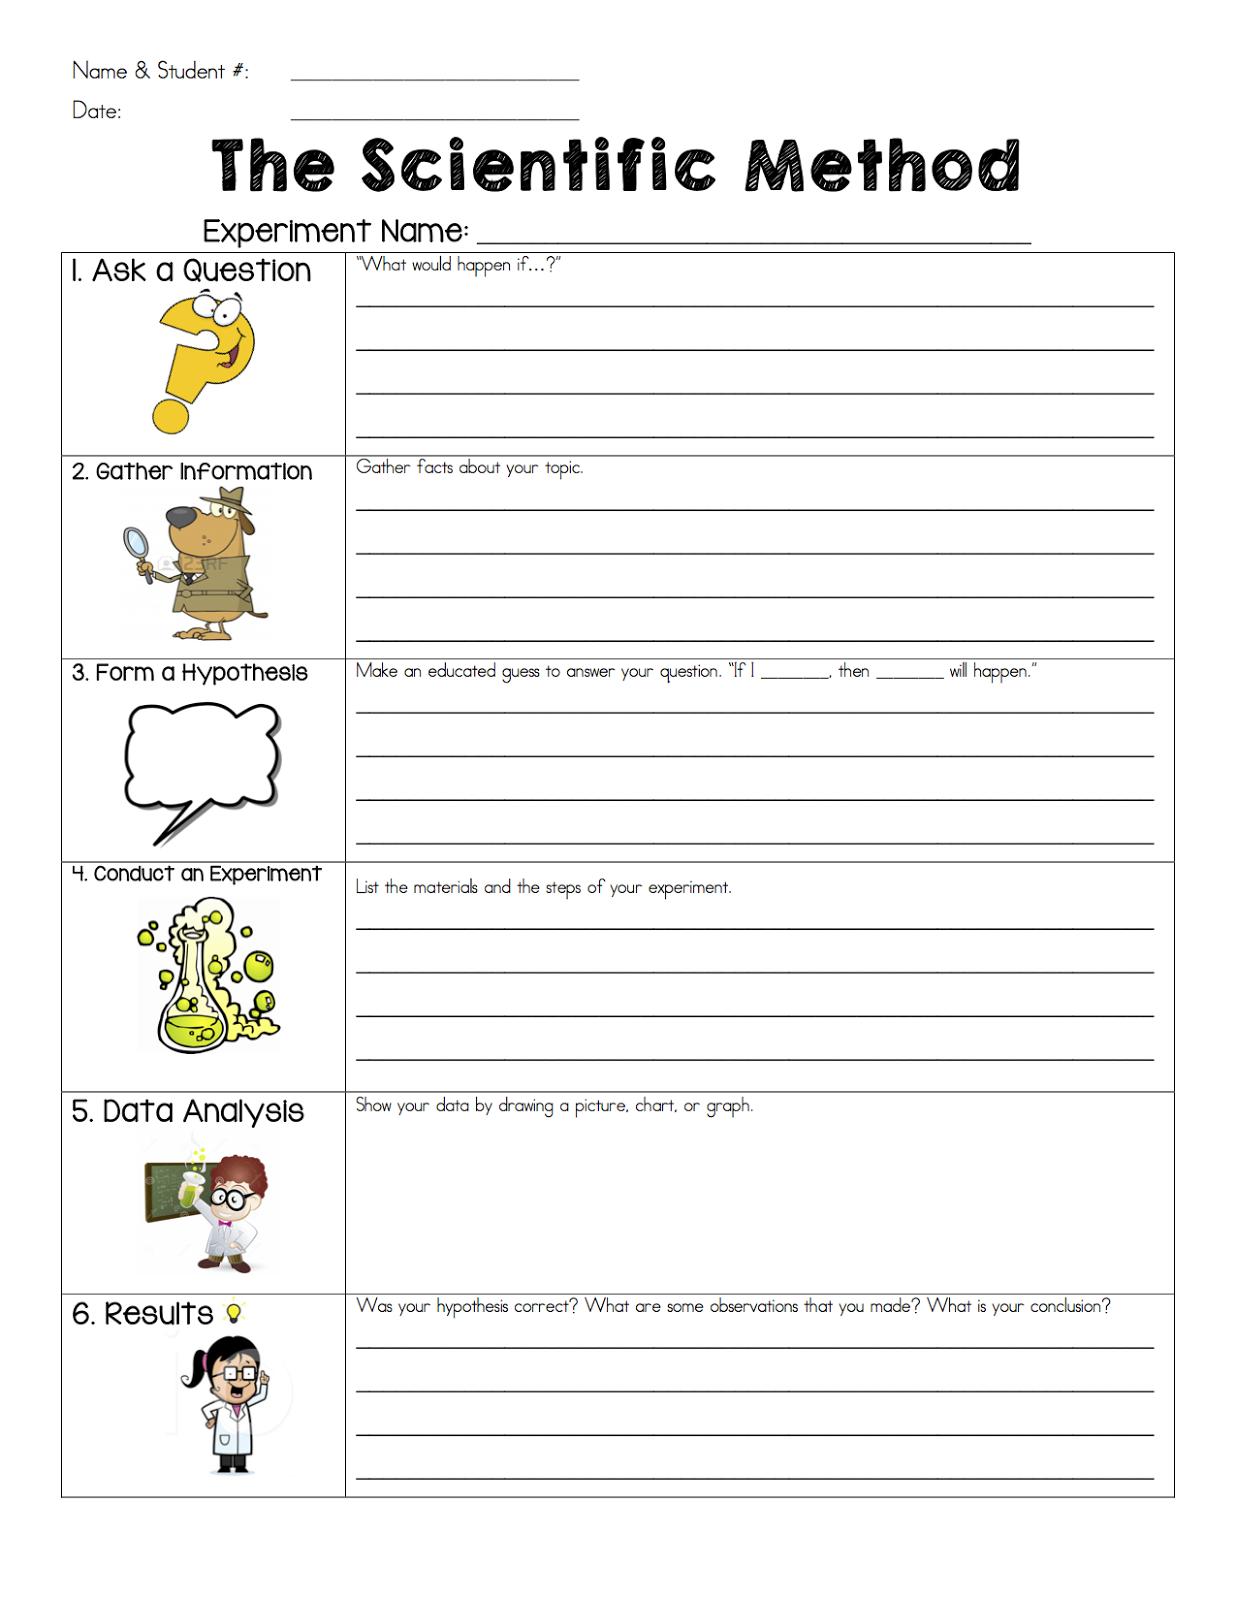 The Scientific Method for Kids Scientific method for